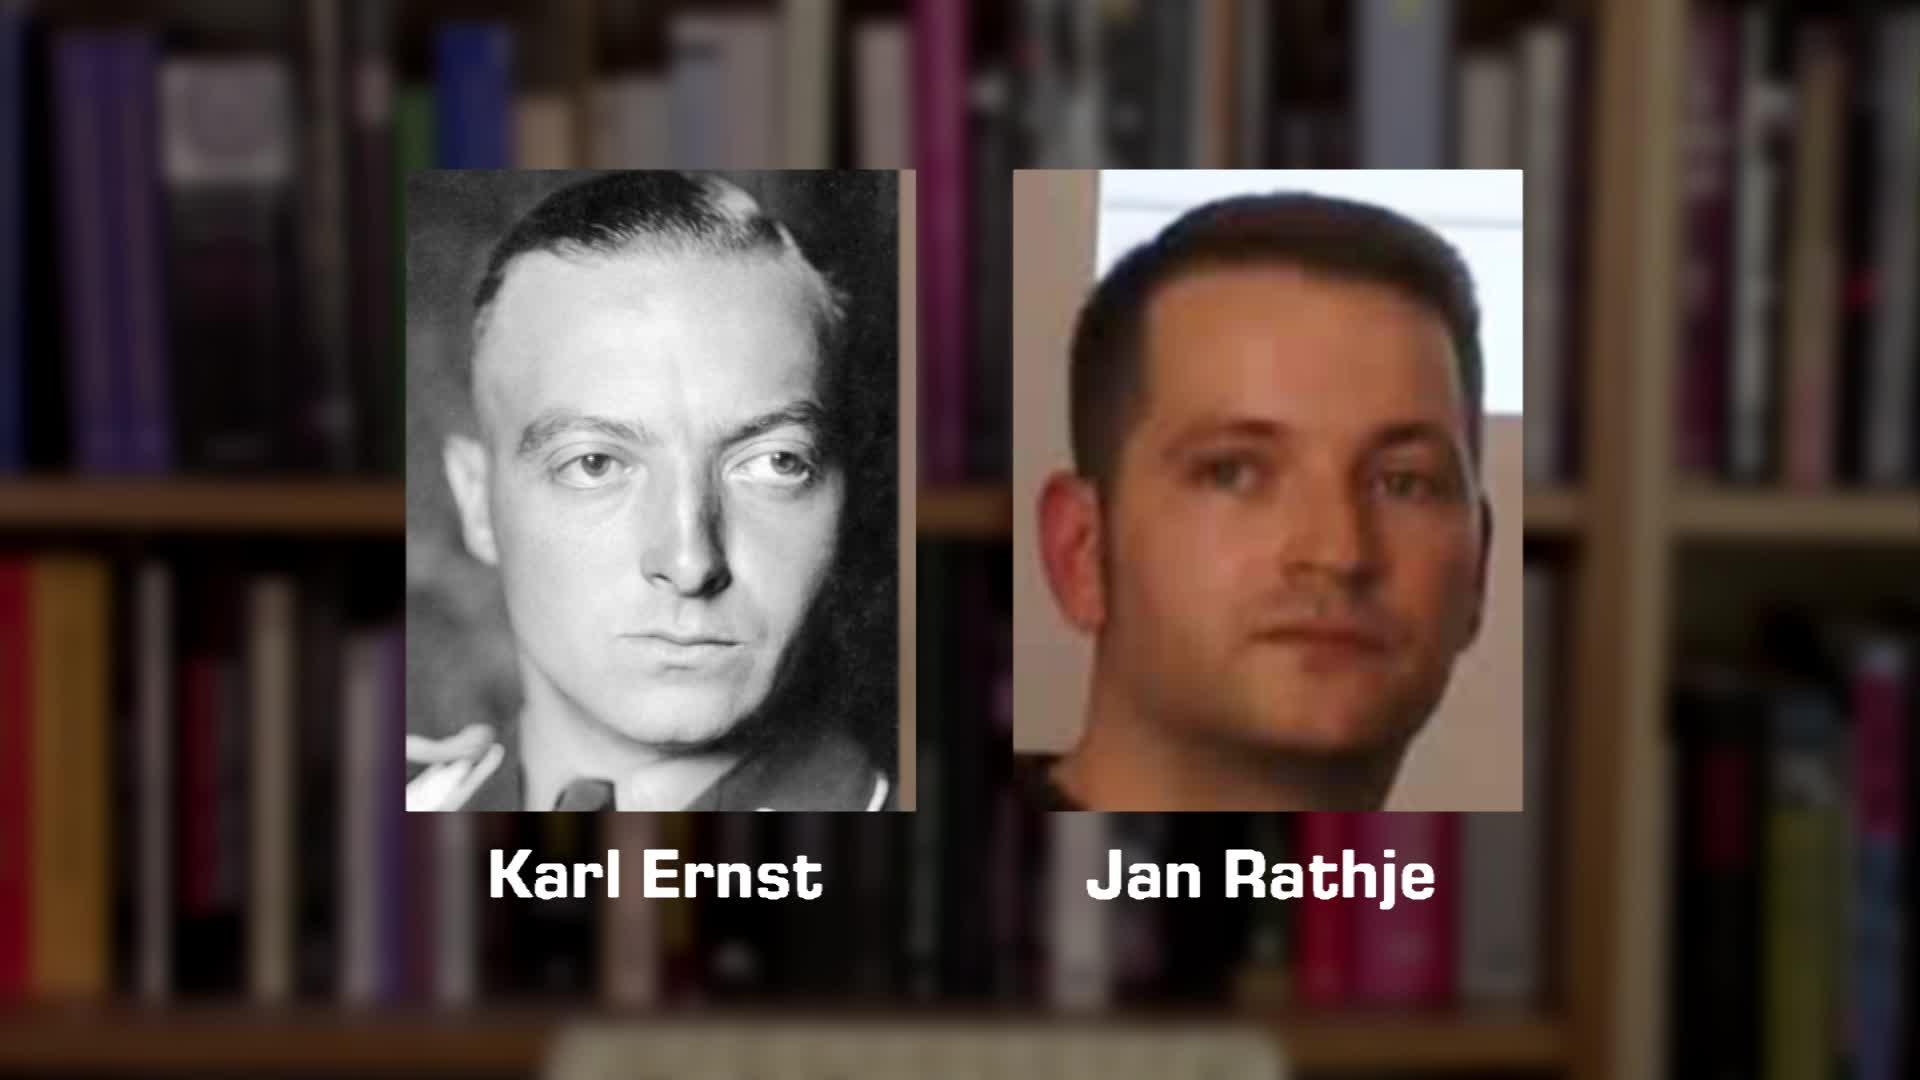 Jan Rathje - Karl Ernst - Amadeu Antonio Stiftung - Sturmabteilung SA